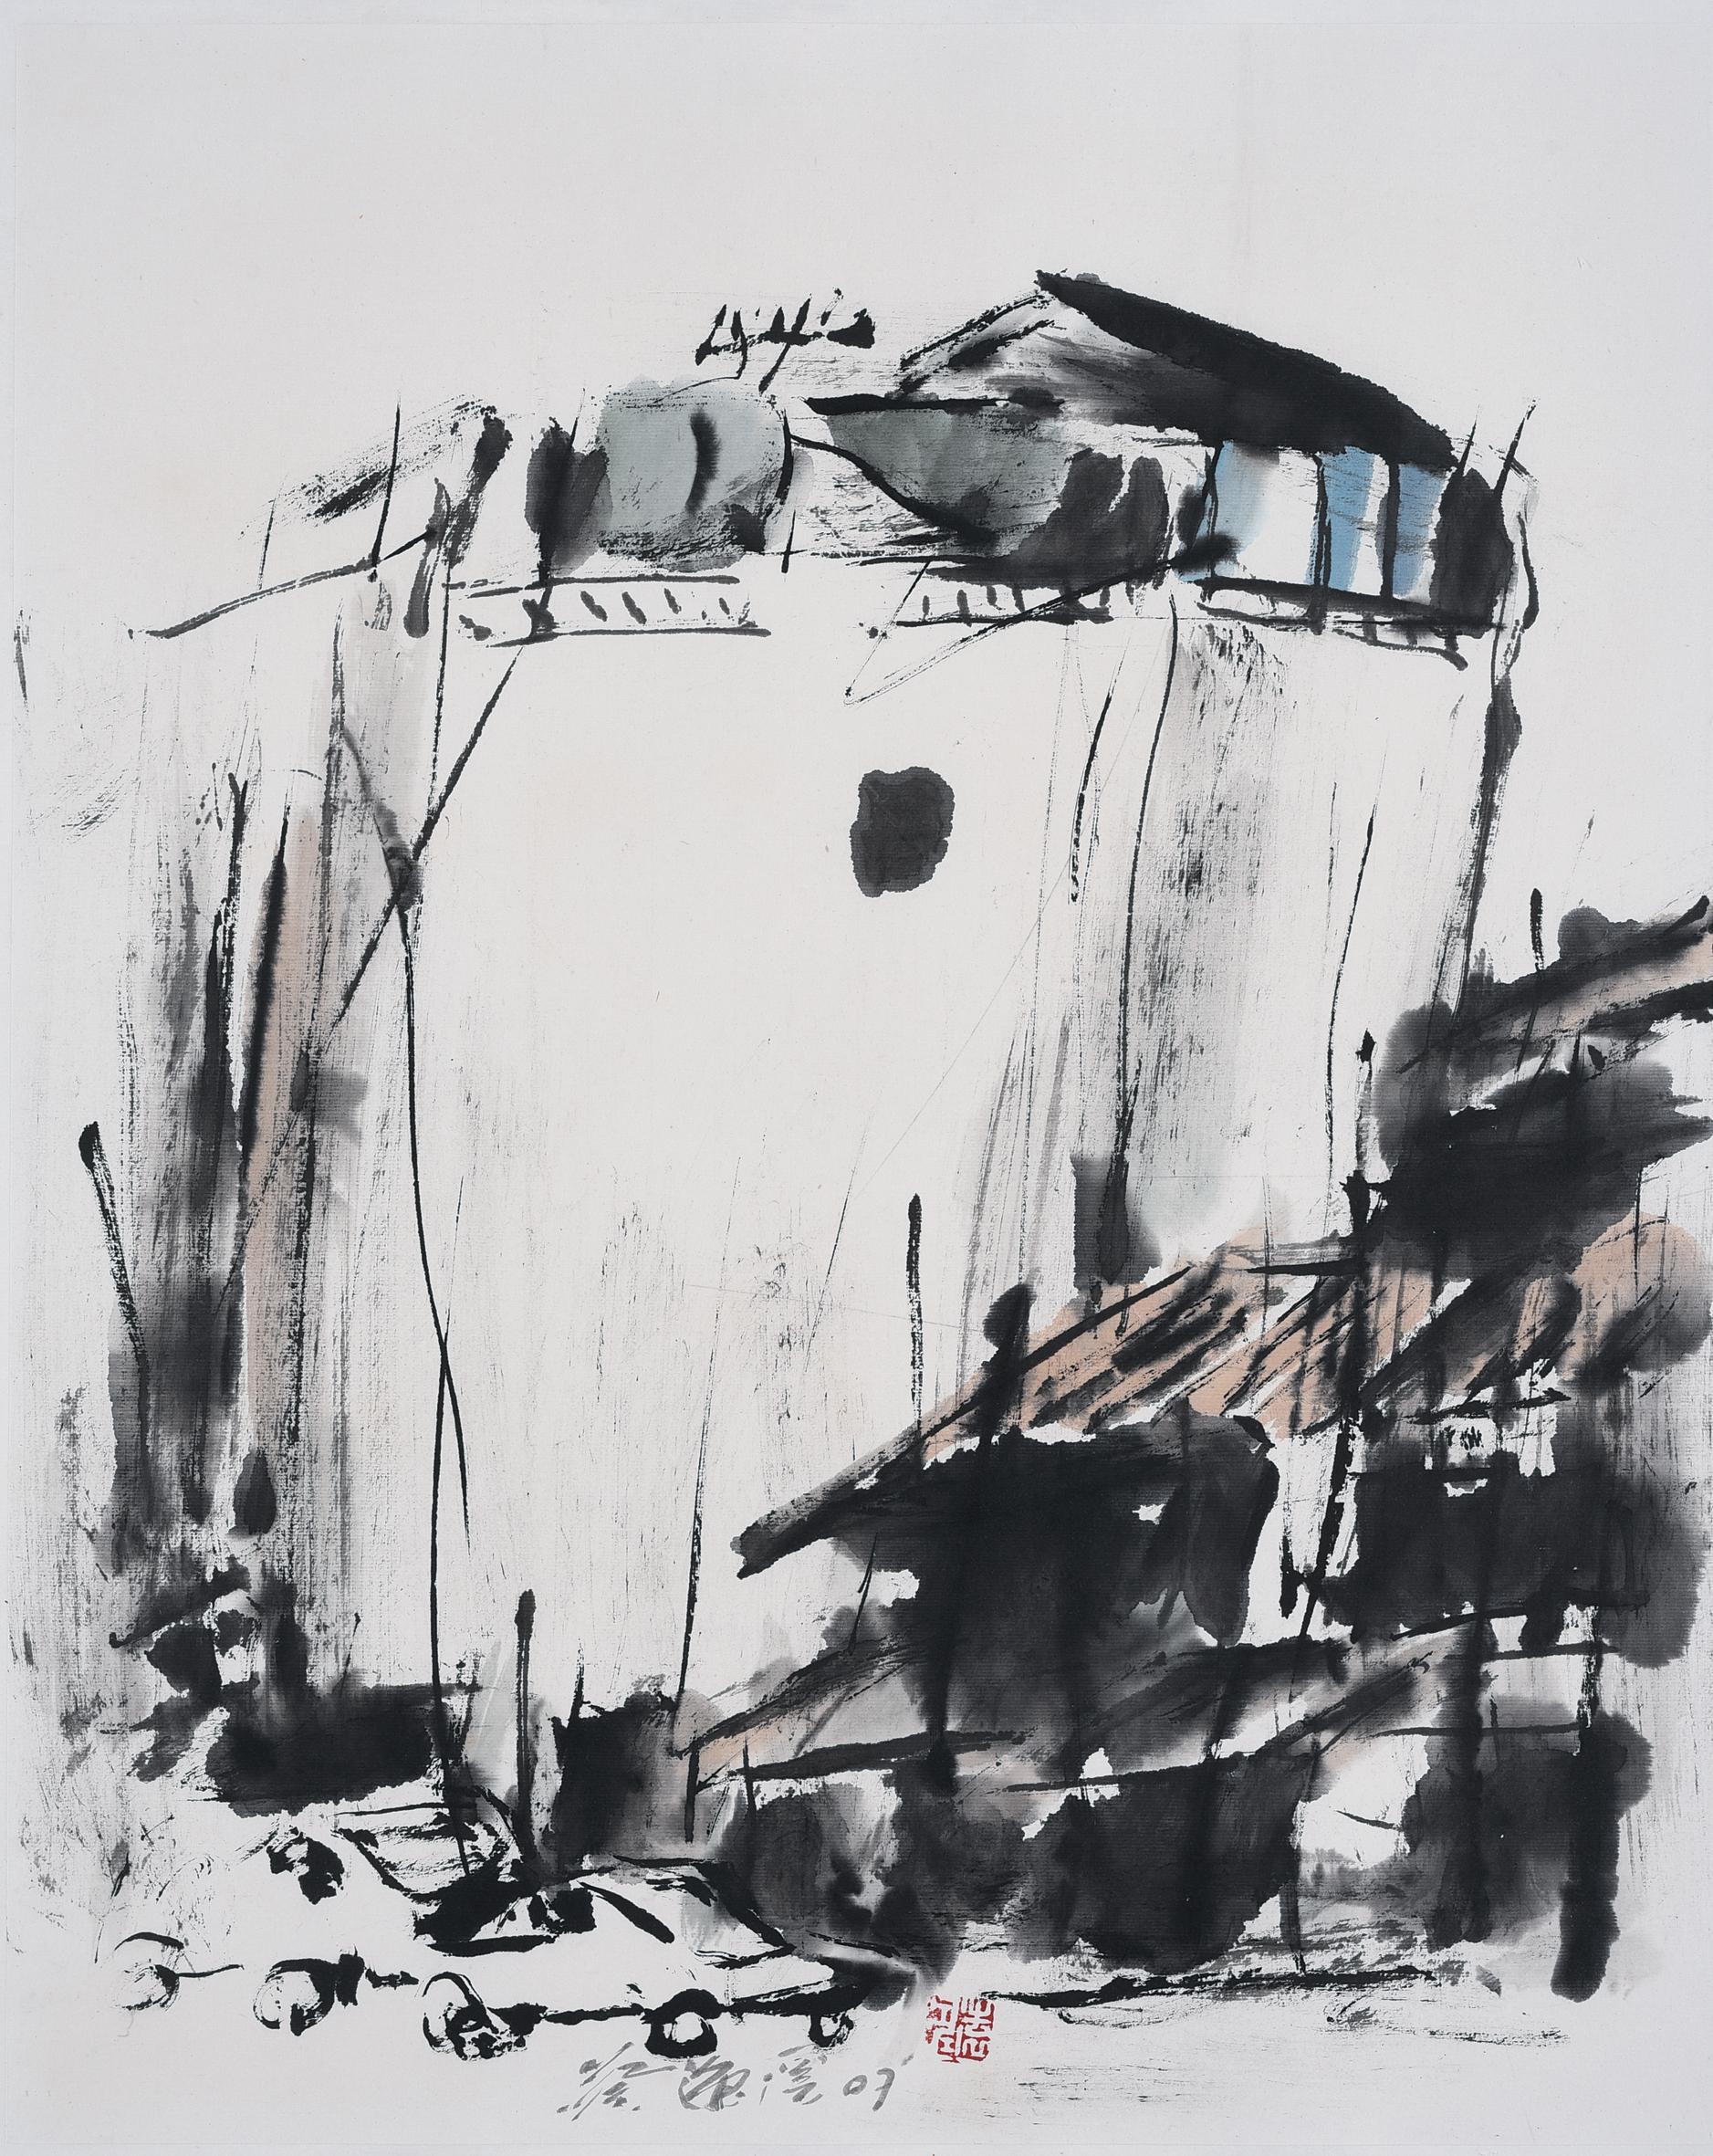 Chua Ek Kay Shophouse Series, ink and colour on paper, 57 x 46 cm, 2007